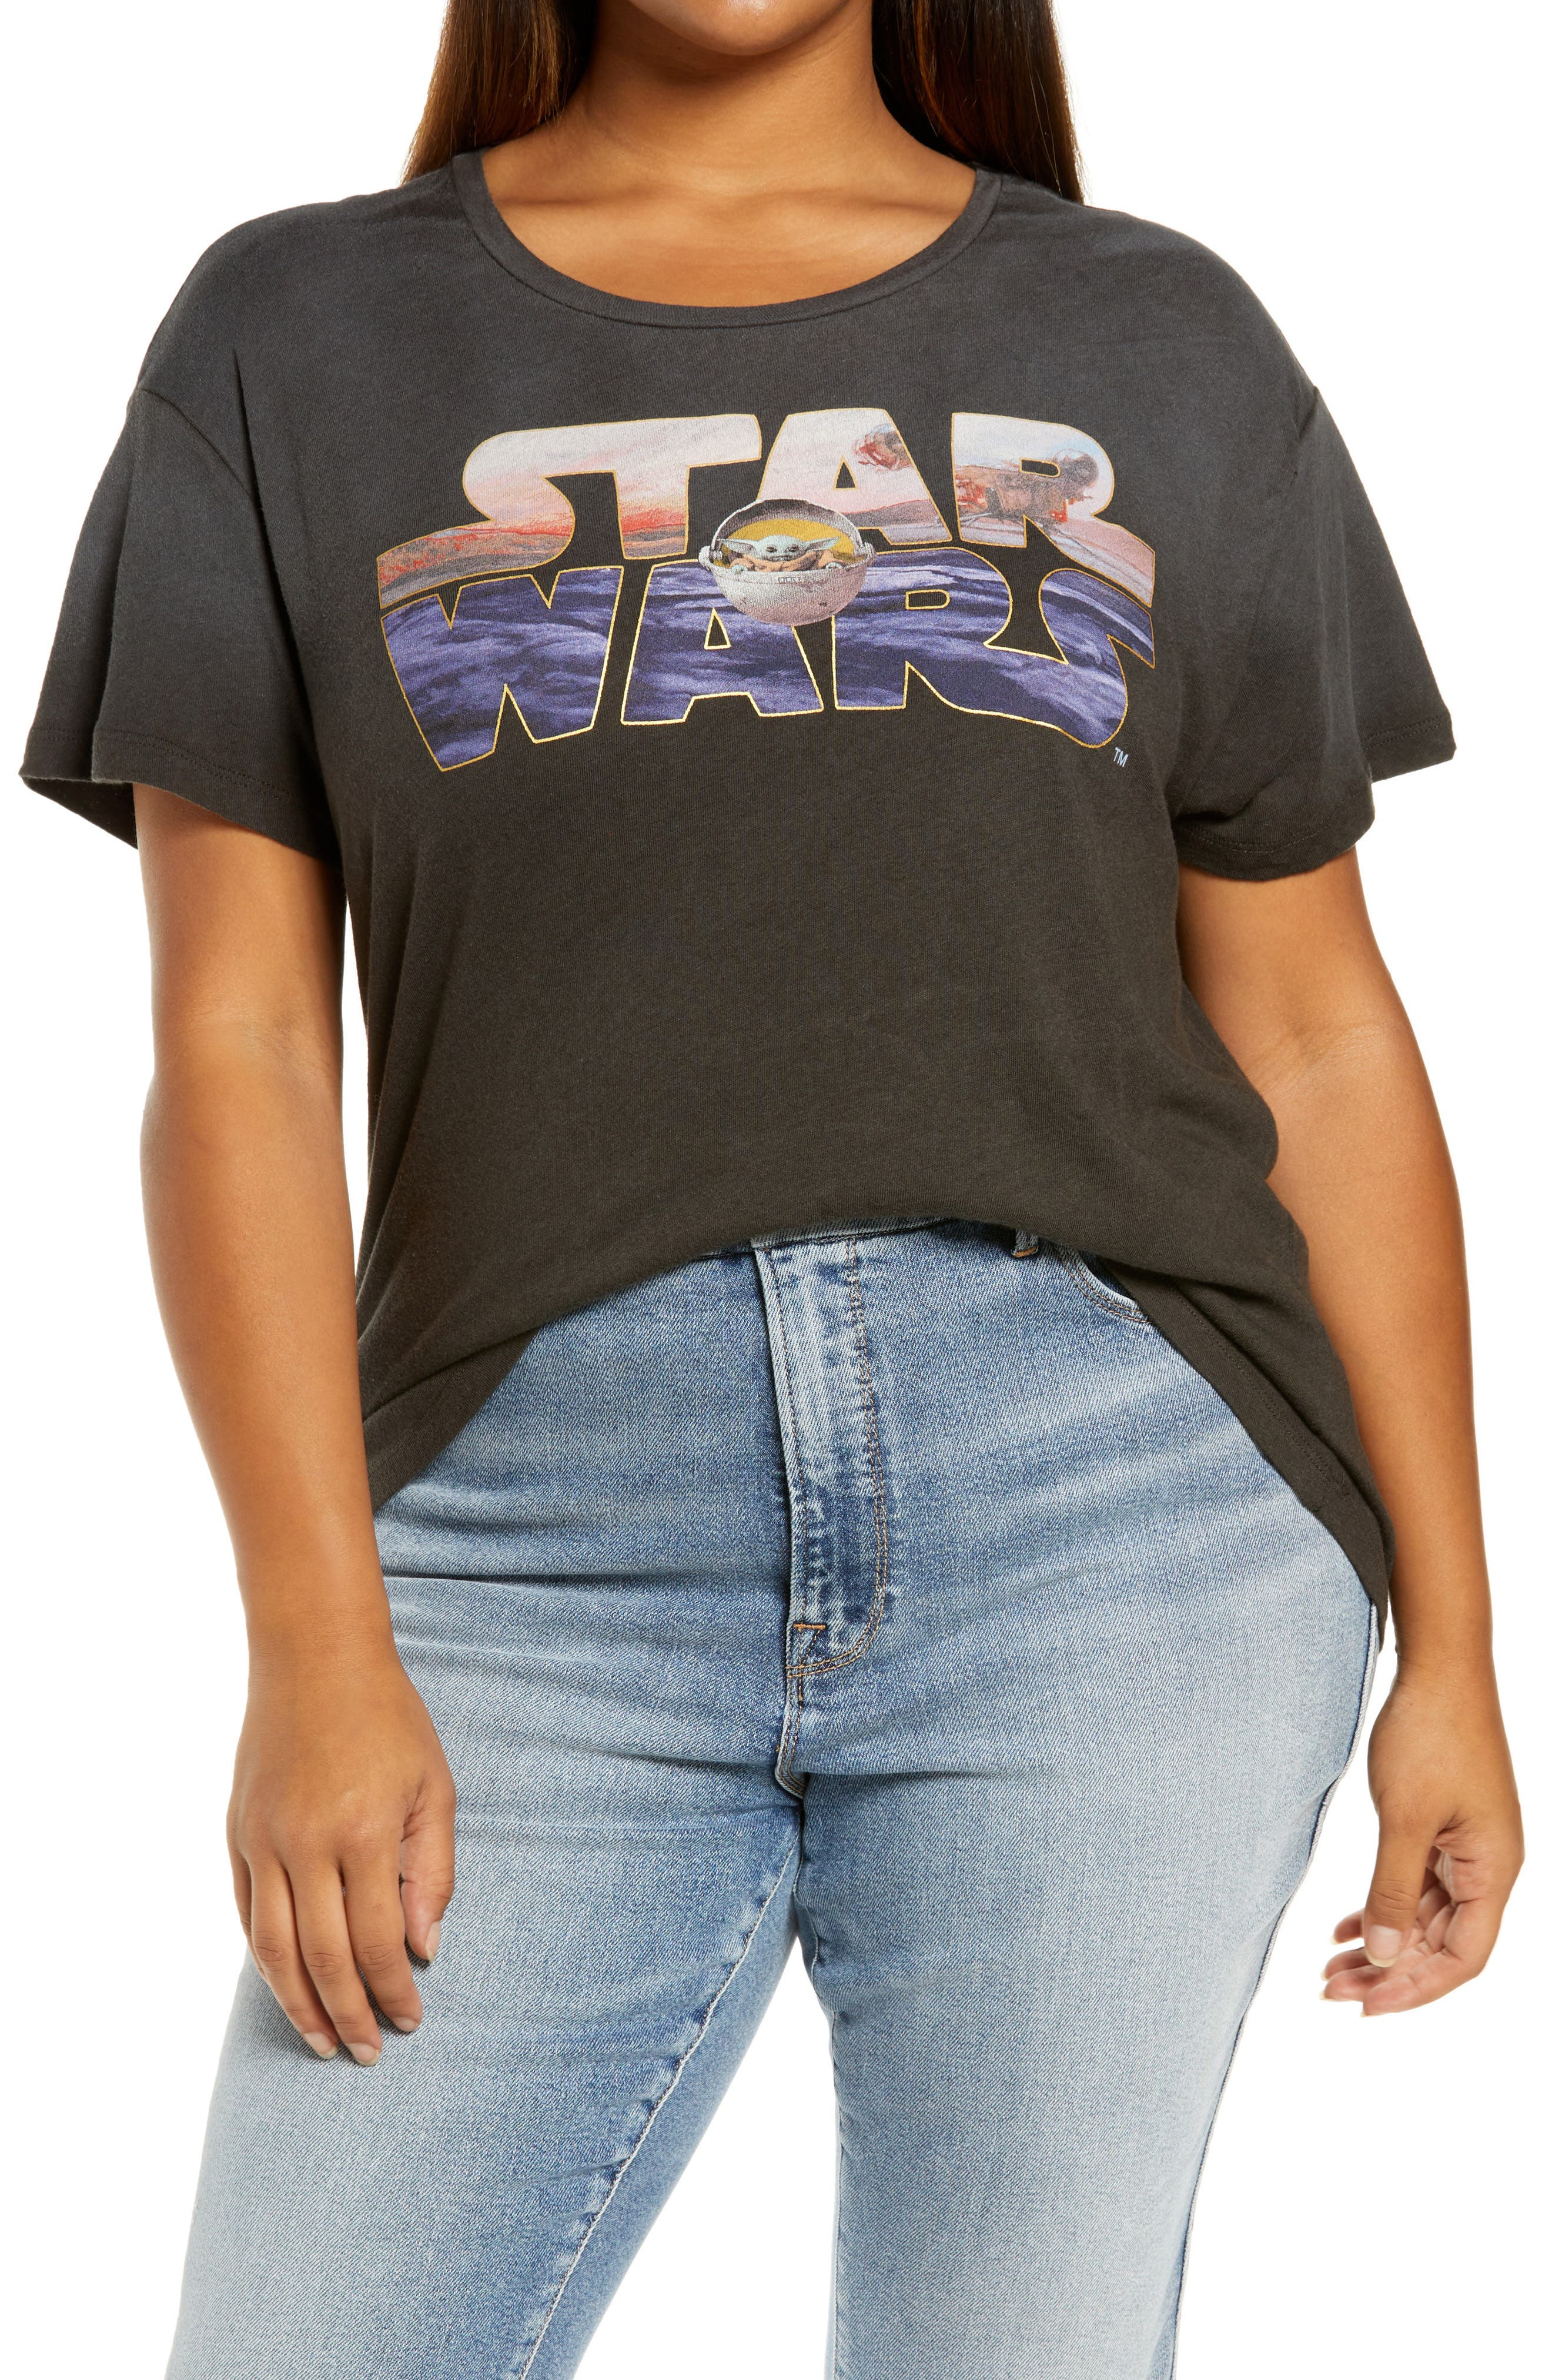 Star Wars(TM) Mandalorian Graphic Tee